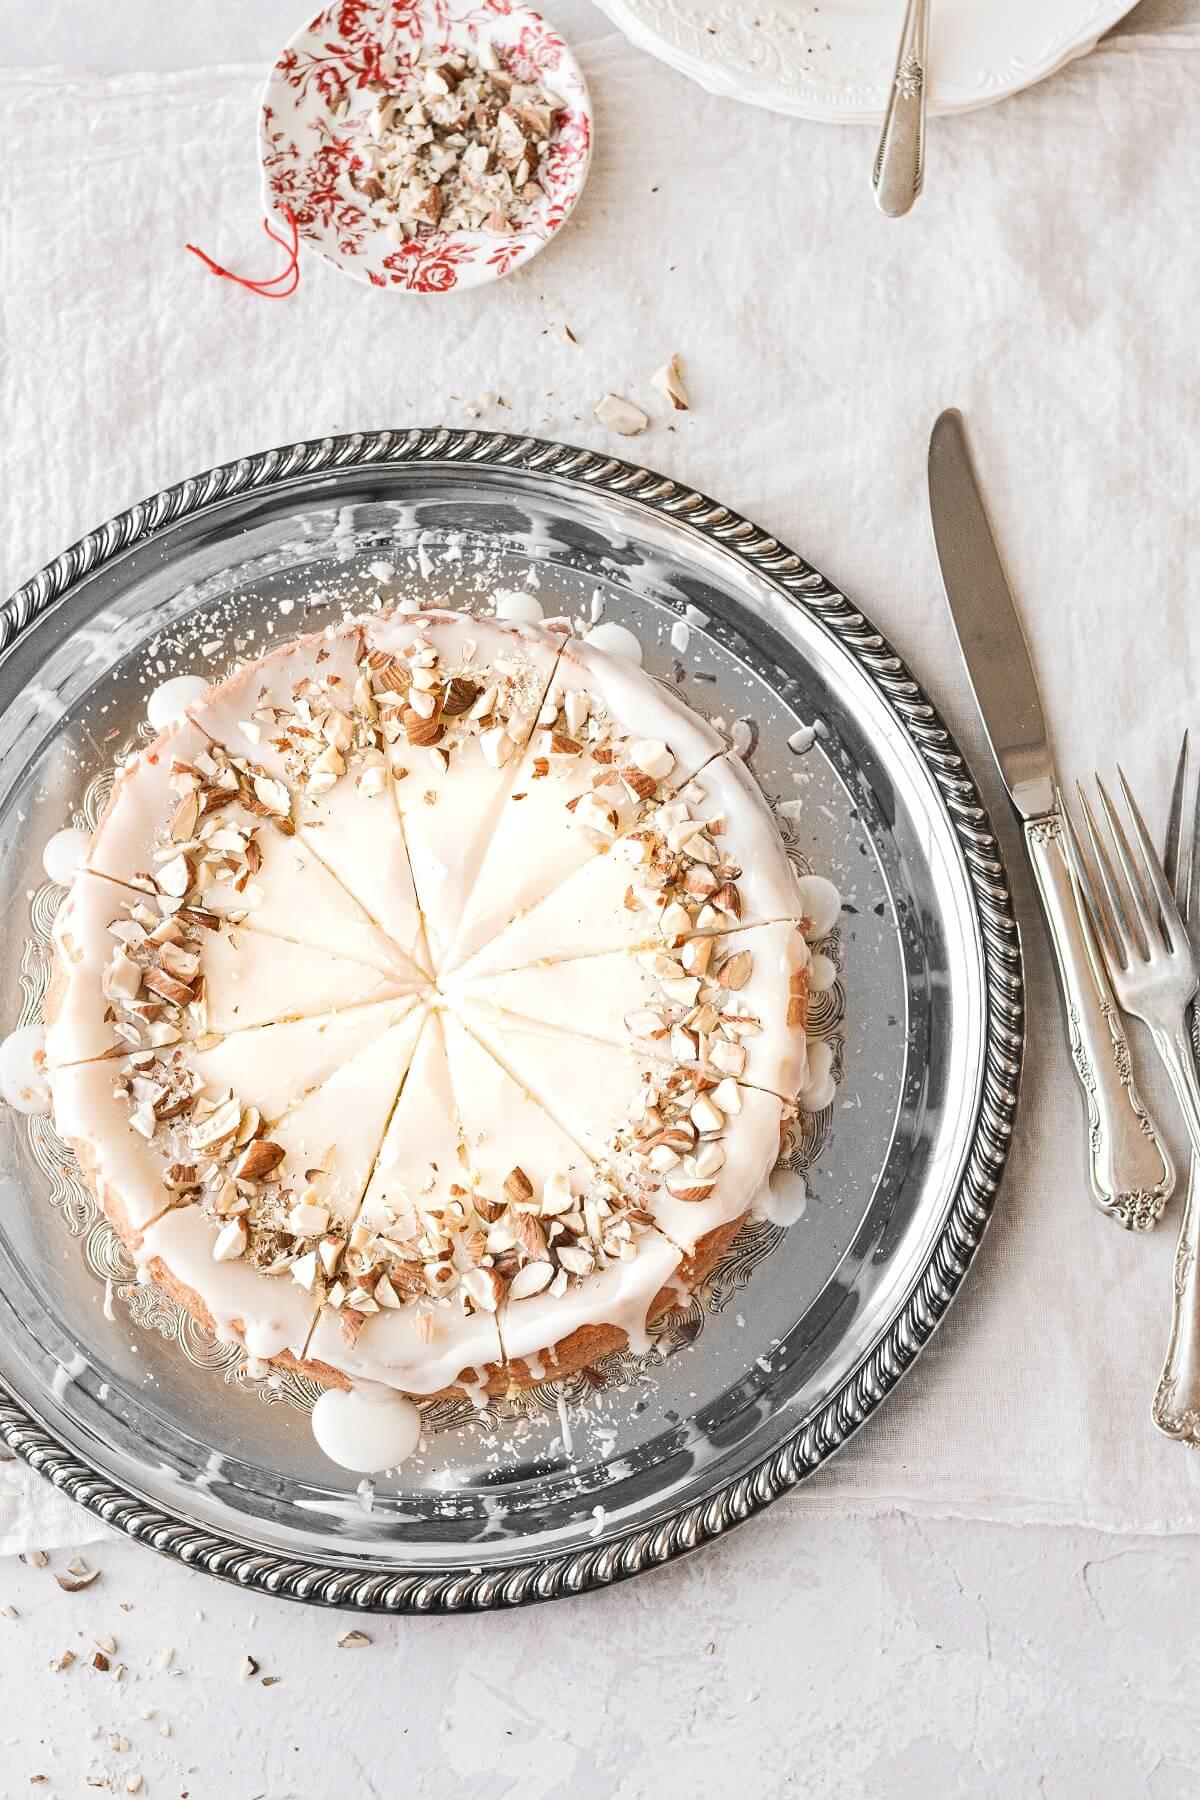 Flourless almond cake, cut into slices.